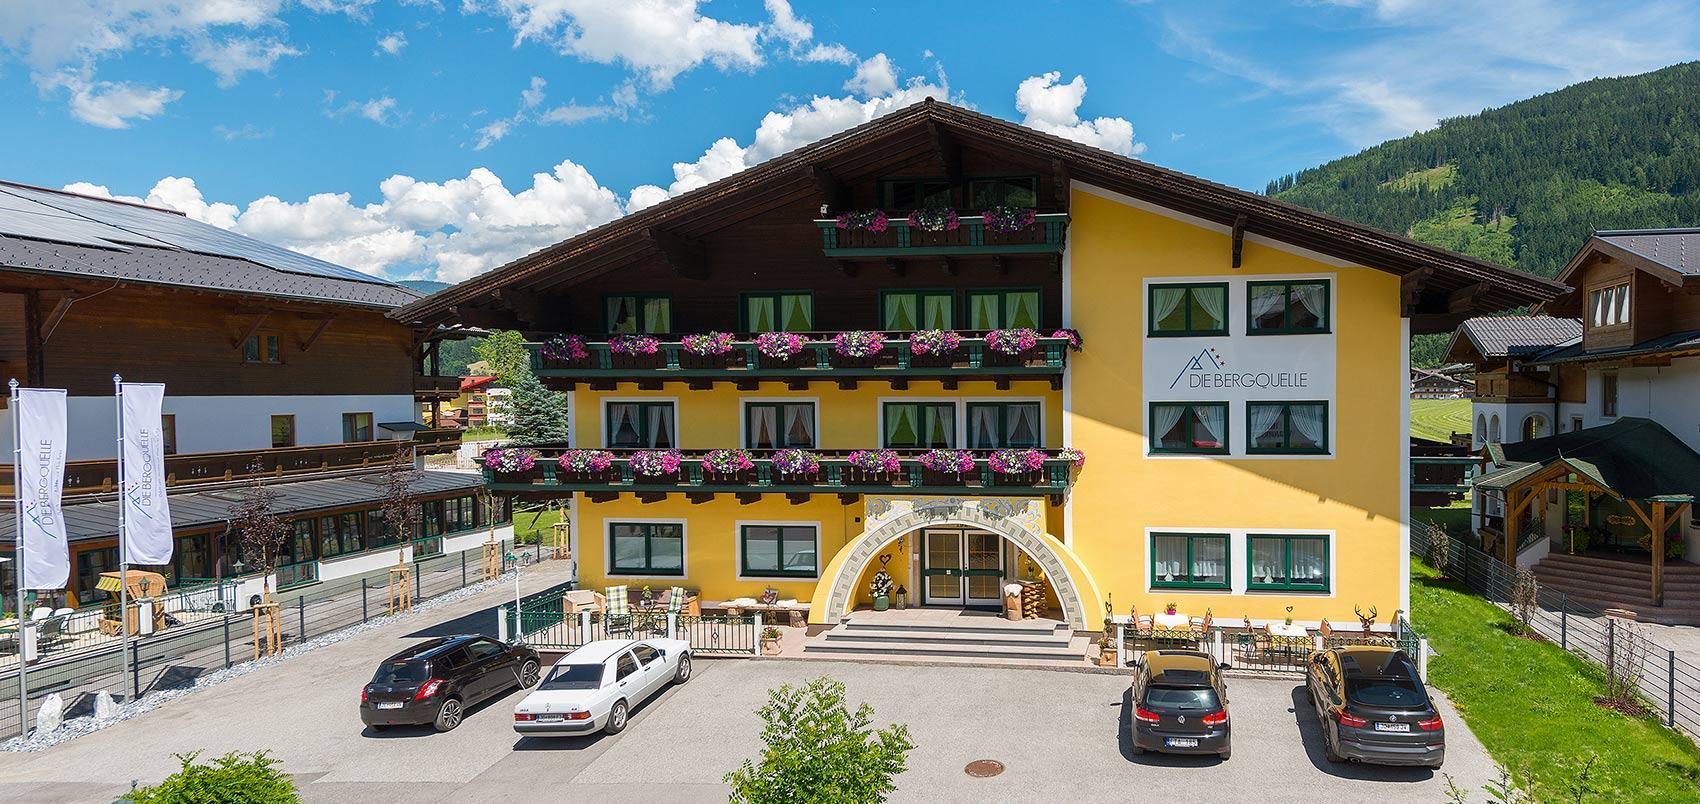 Sommerurlaub im BB Hotel Bergquelle Flachau Salzburg Austria